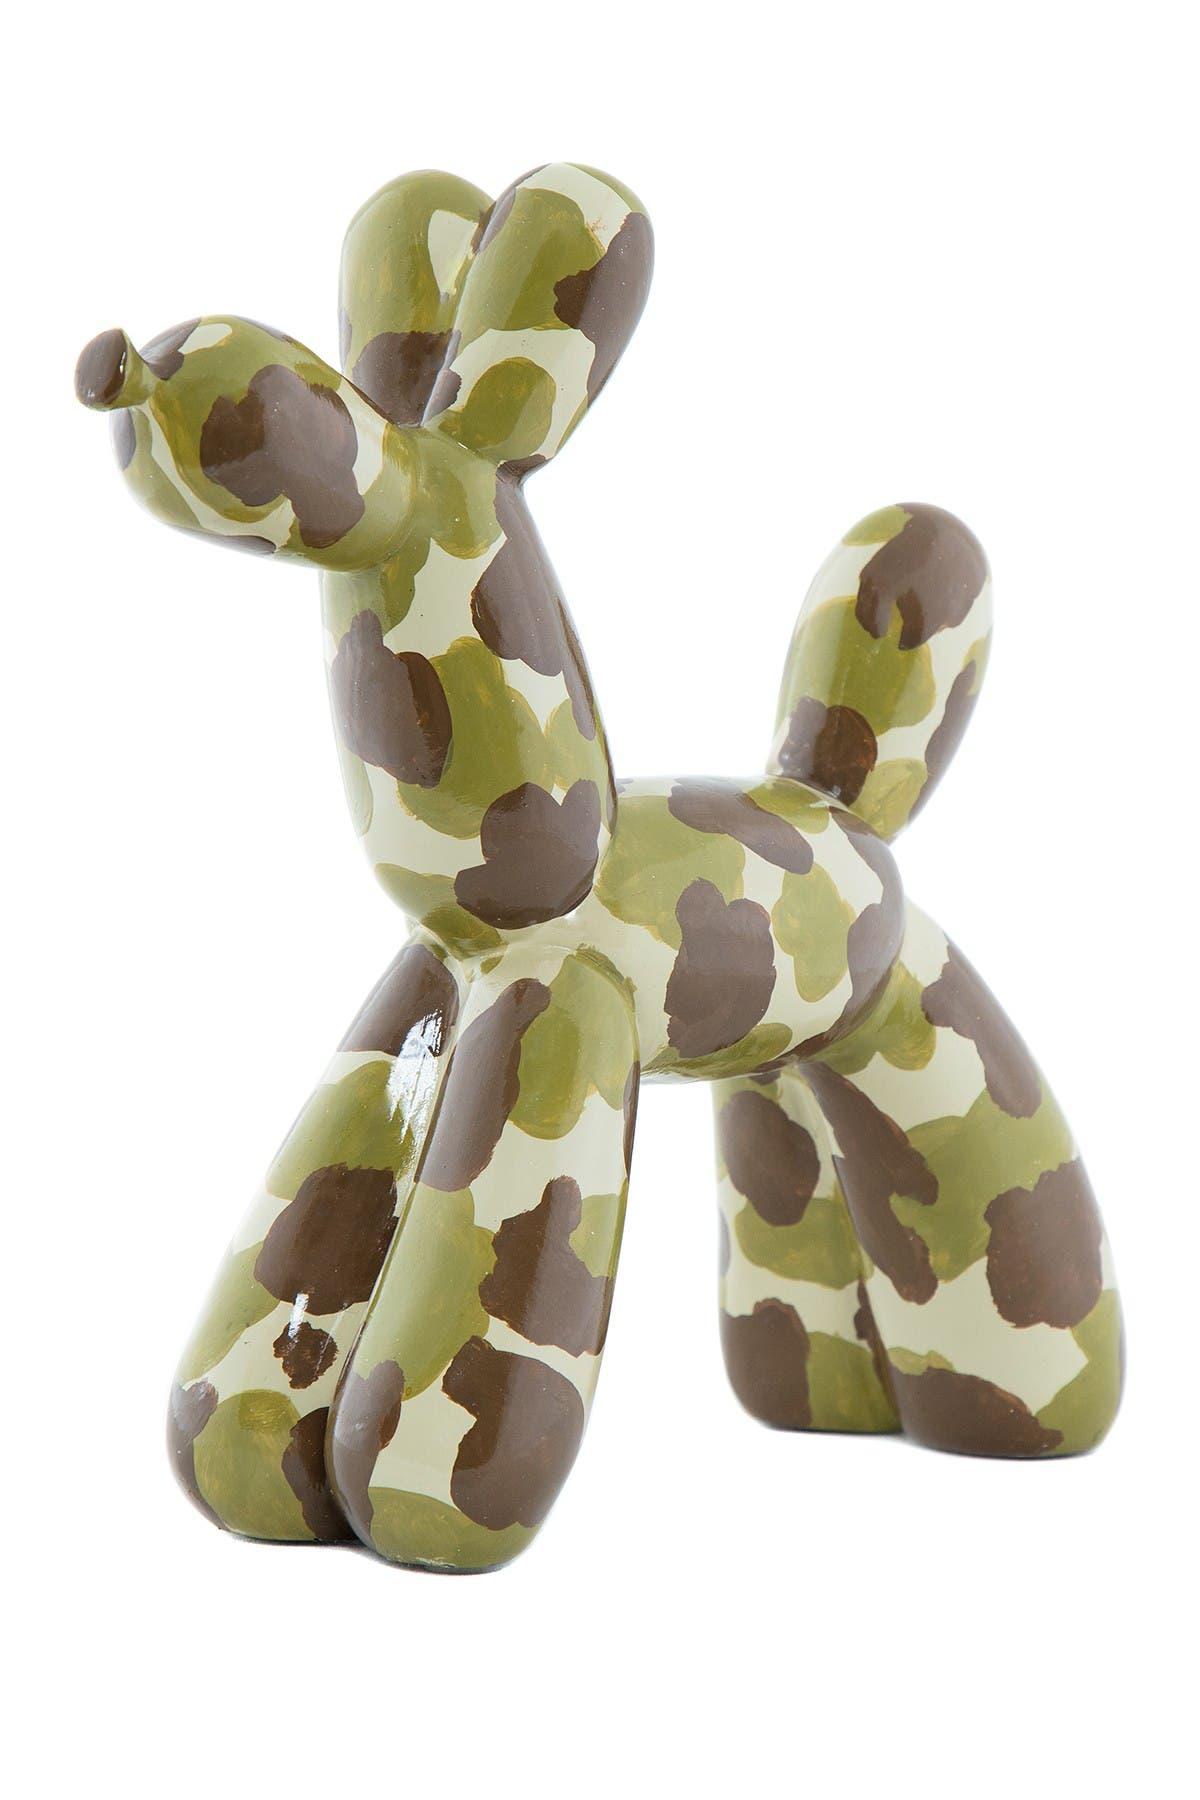 Image of Interior Illusions Camouflage Balloon Dog